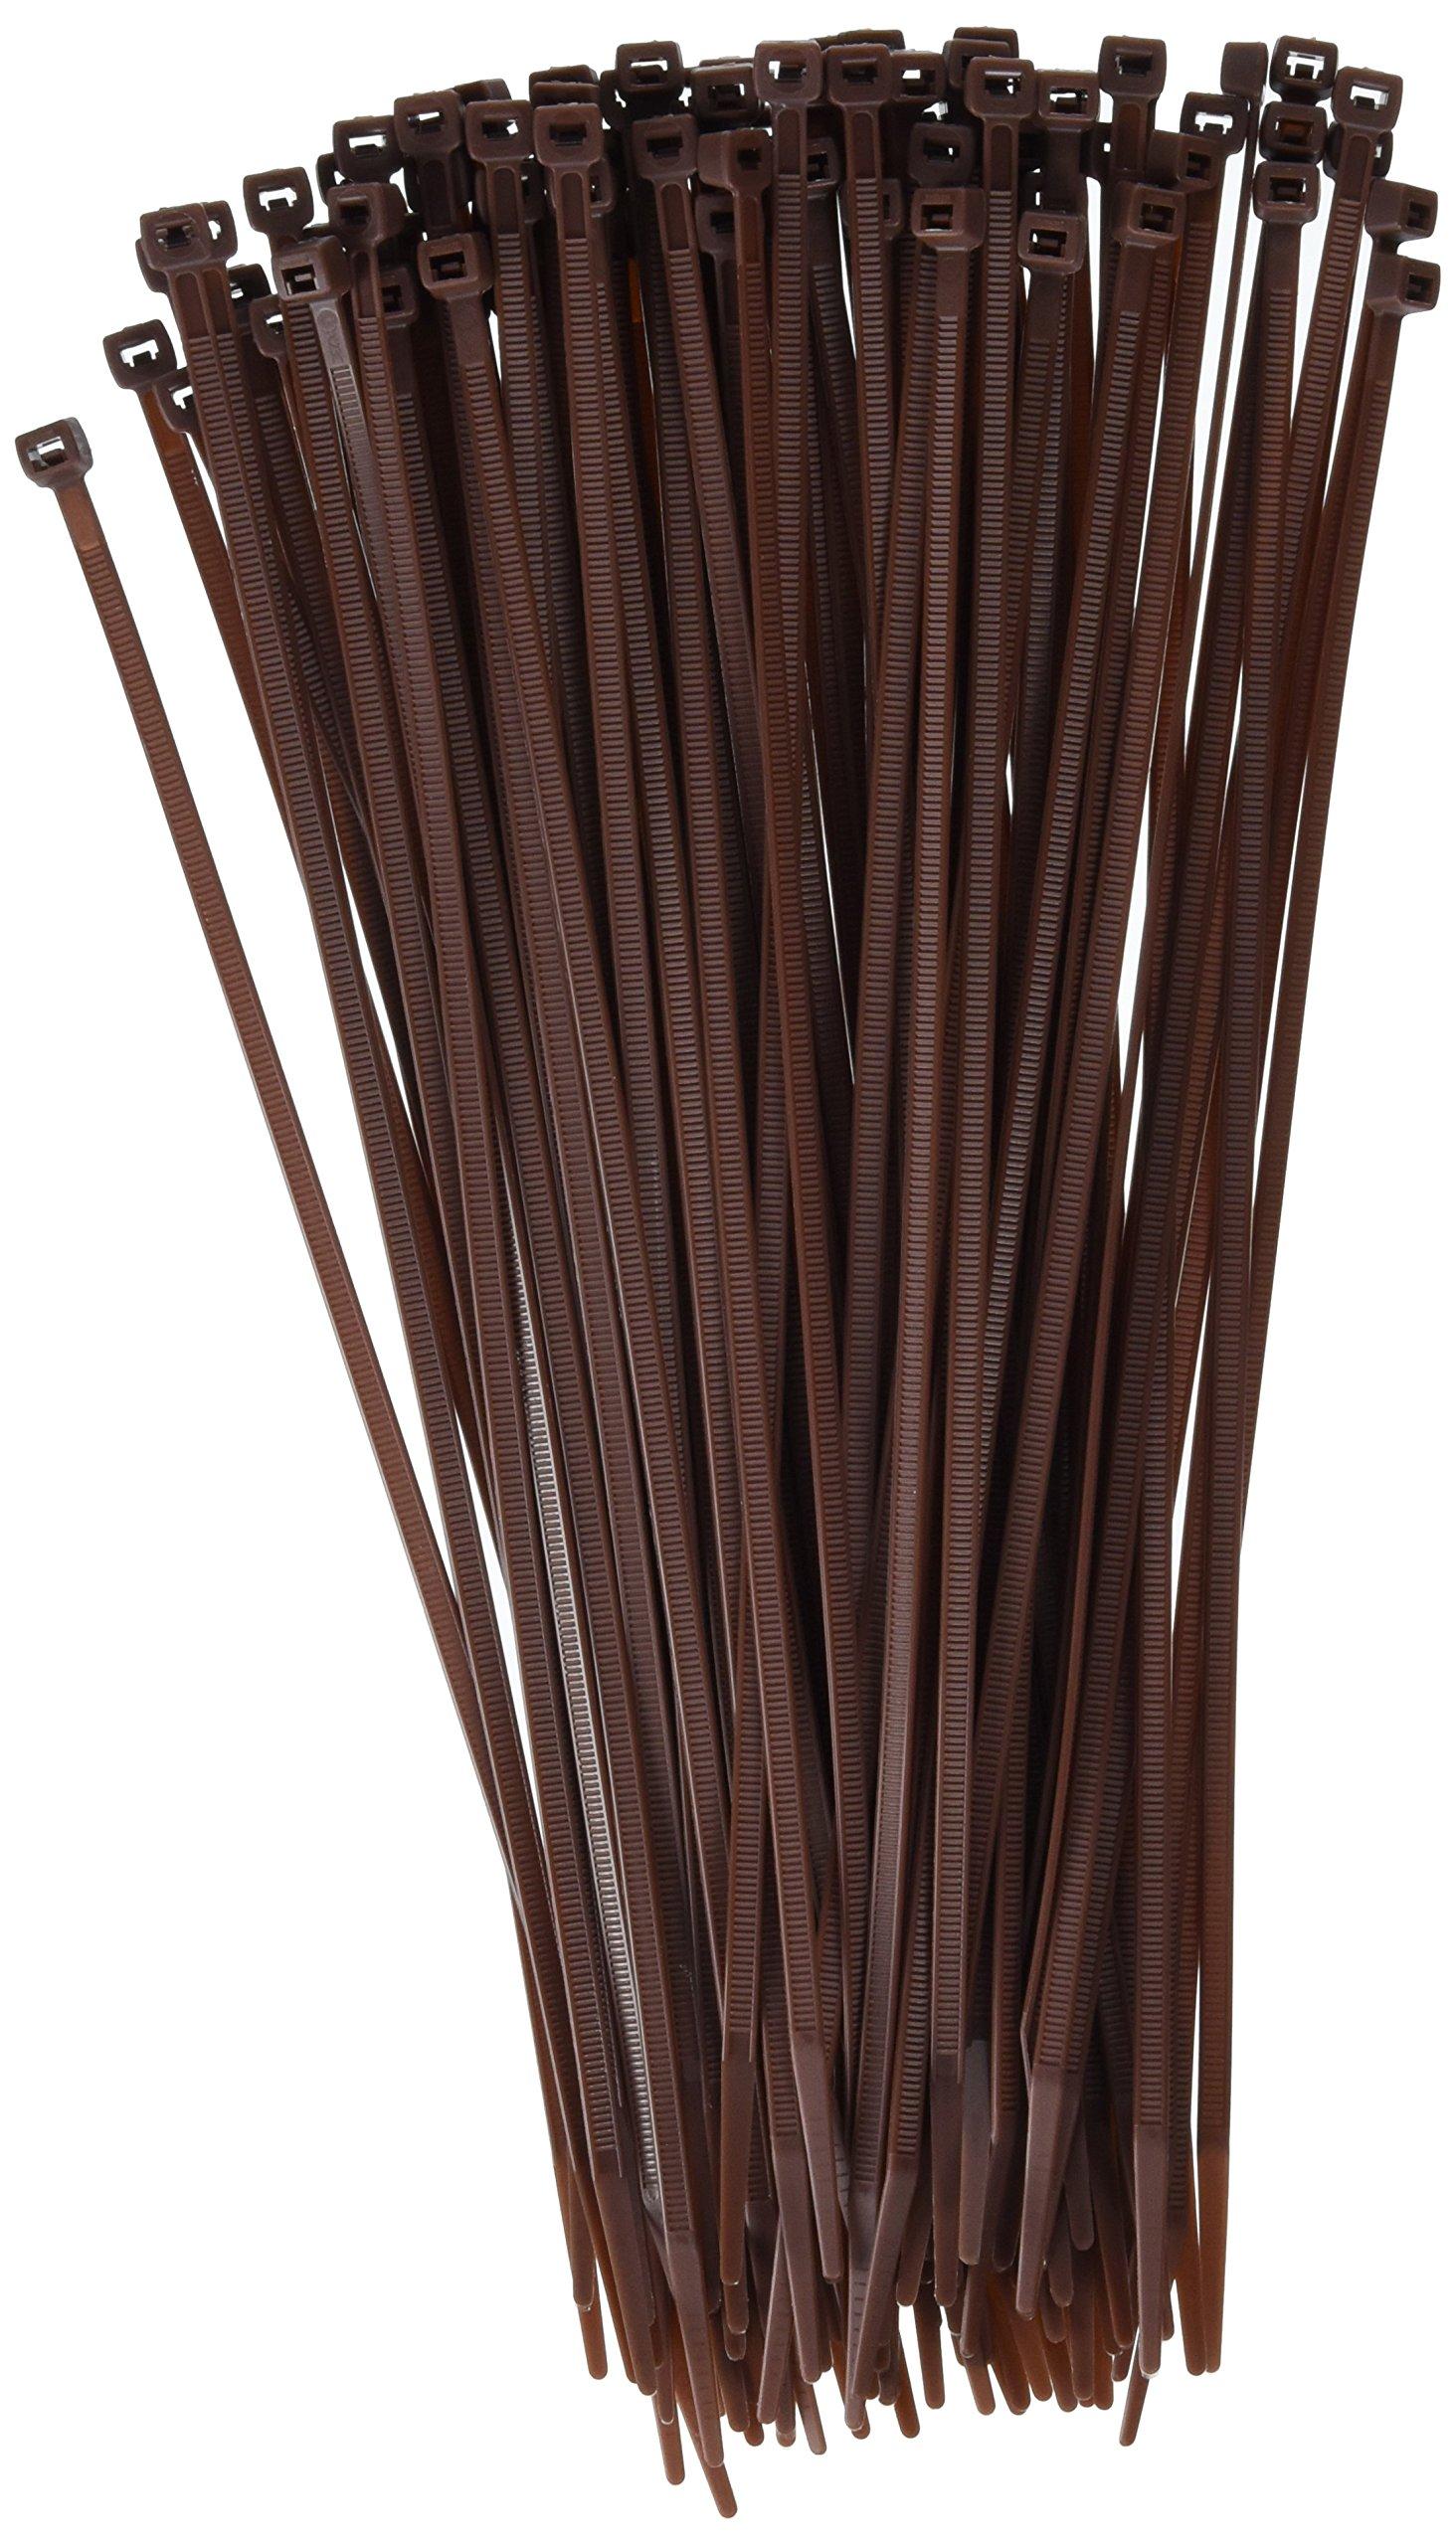 11-in, 100-Pack, 75-lb, Dark Brown, Standard Nylon Cable Tie